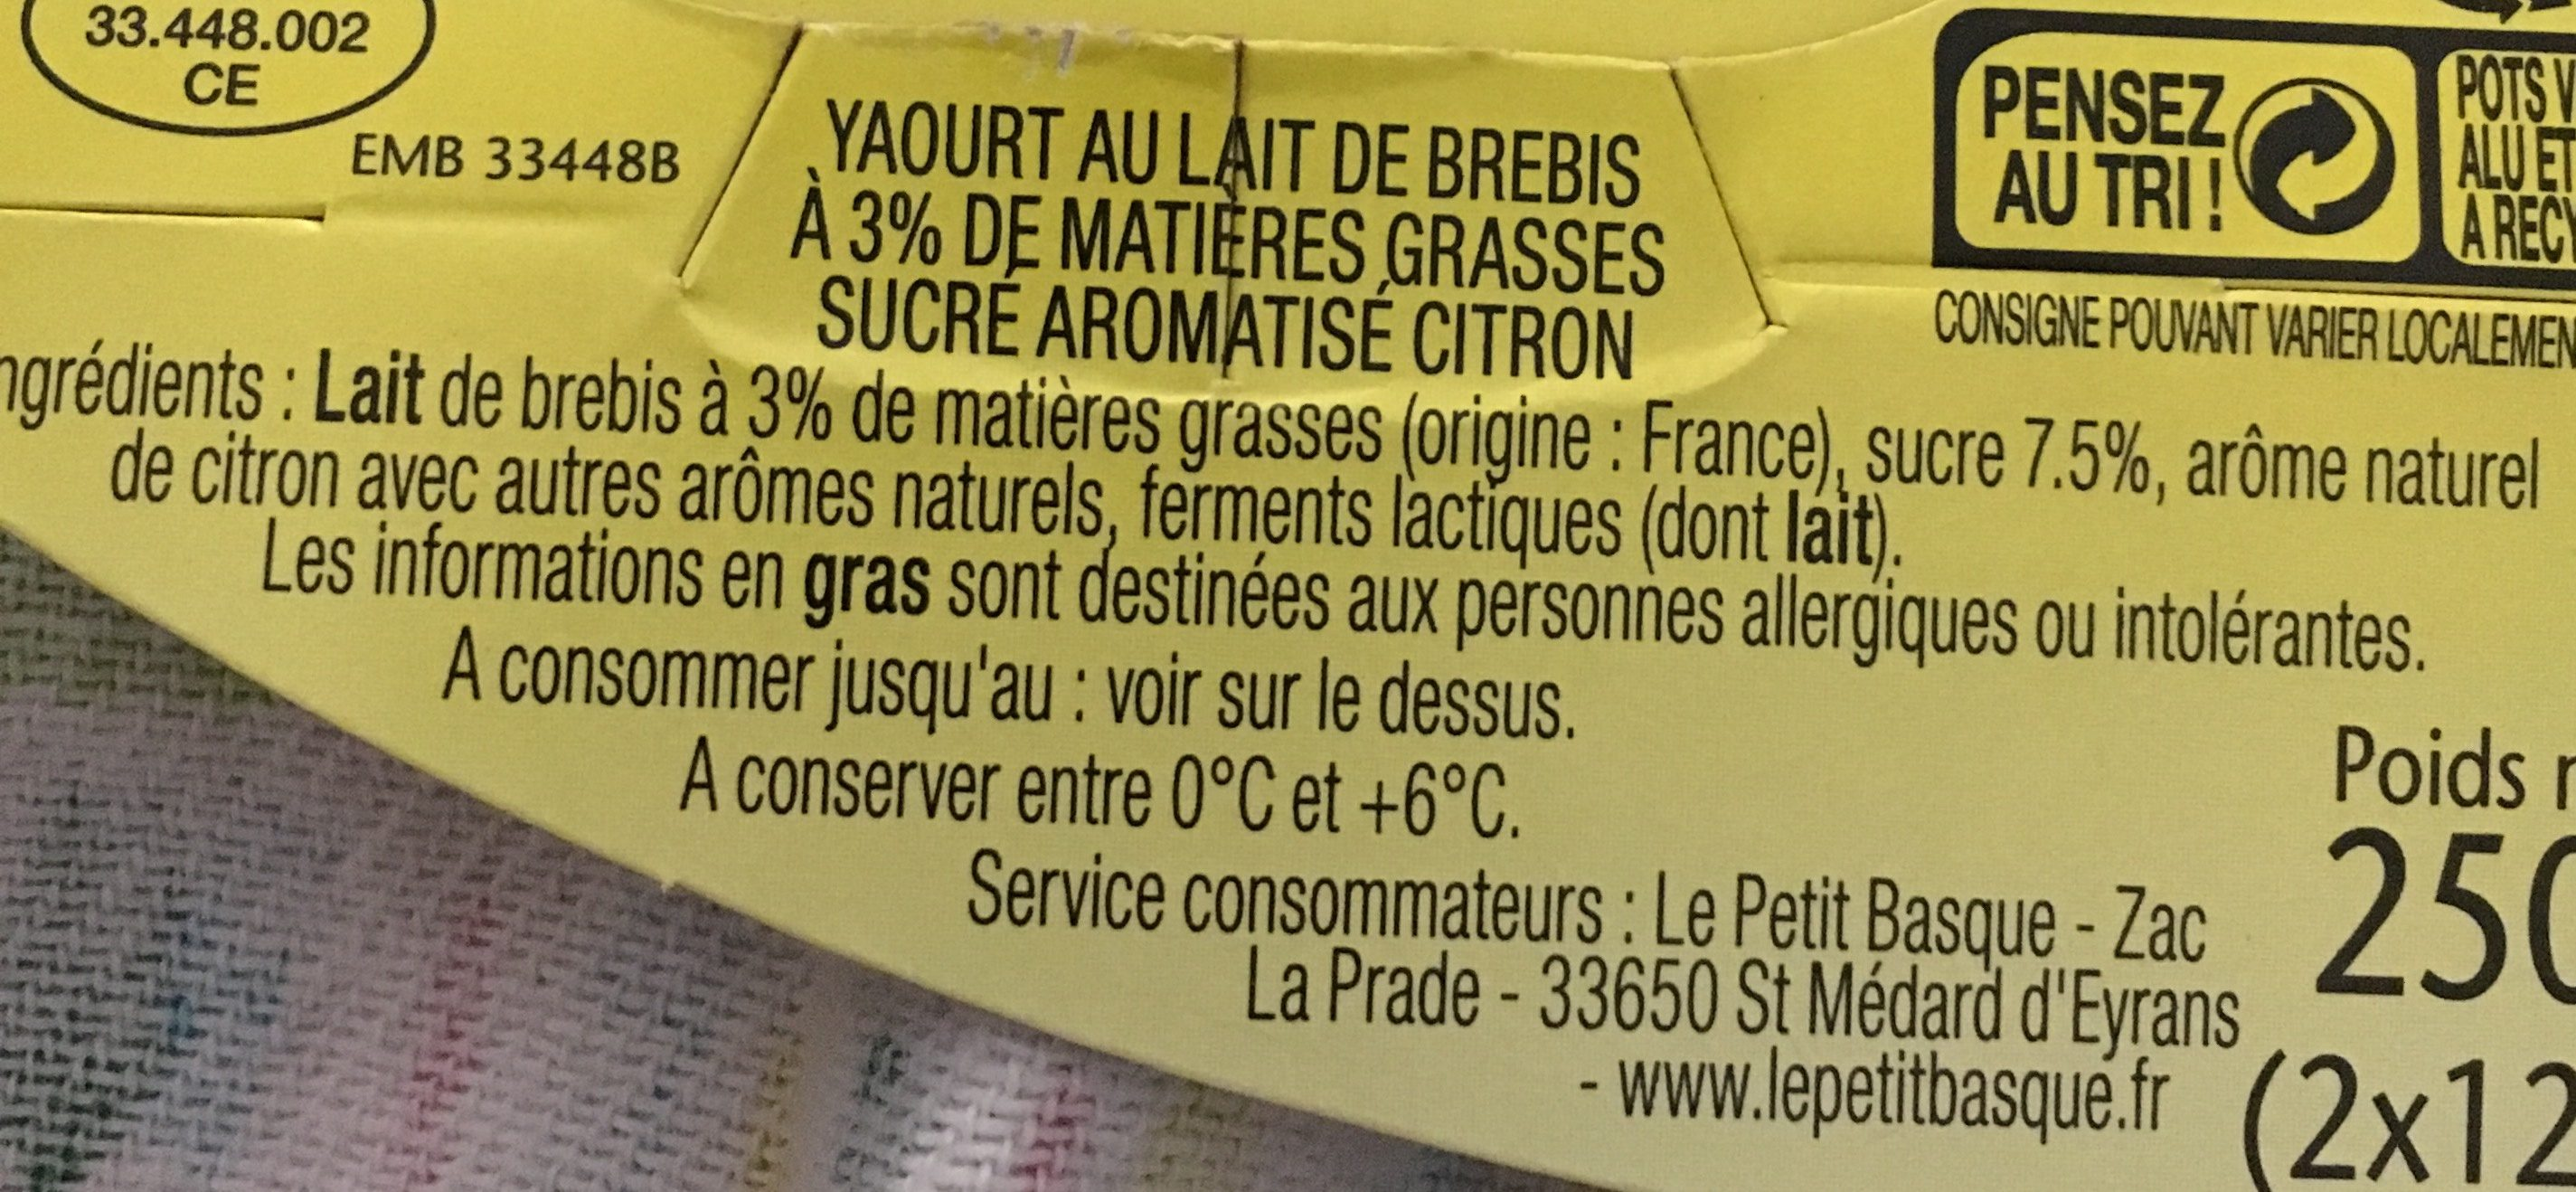 Yaourt de Brebis saveur citron - Ingredients